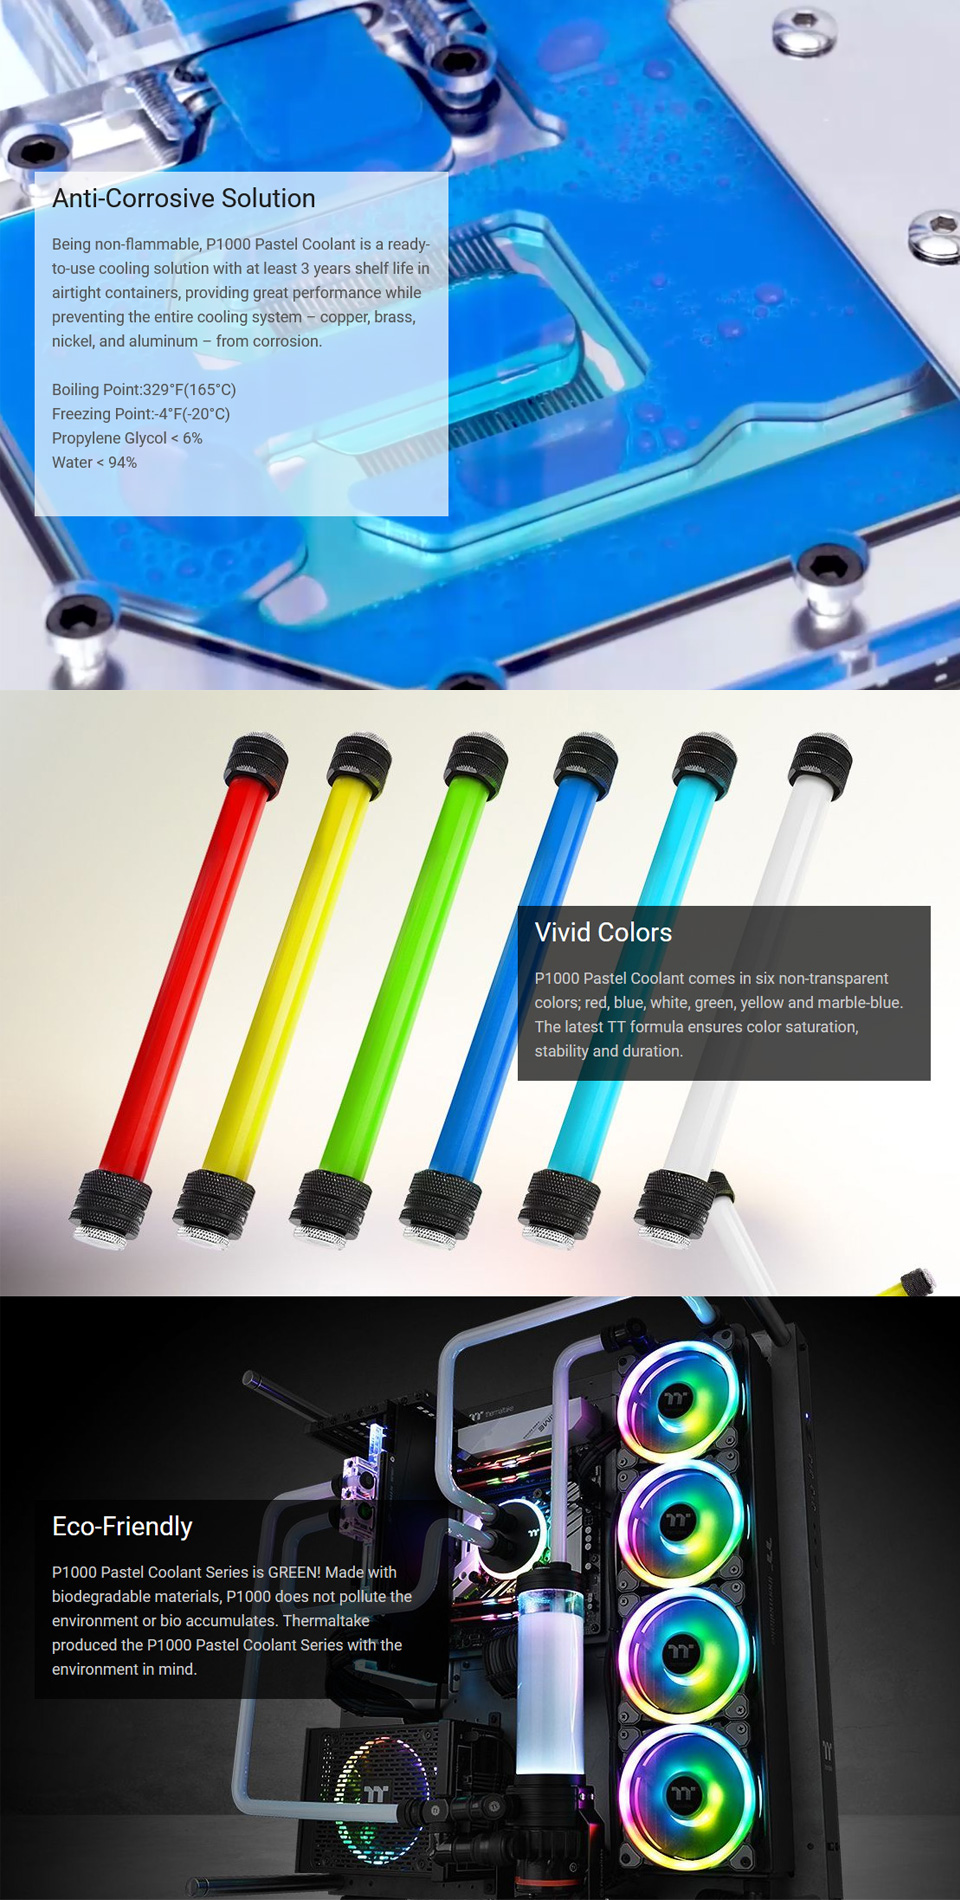 Thermaltake P1000 Pastel Coolant 1L Marble Blue features